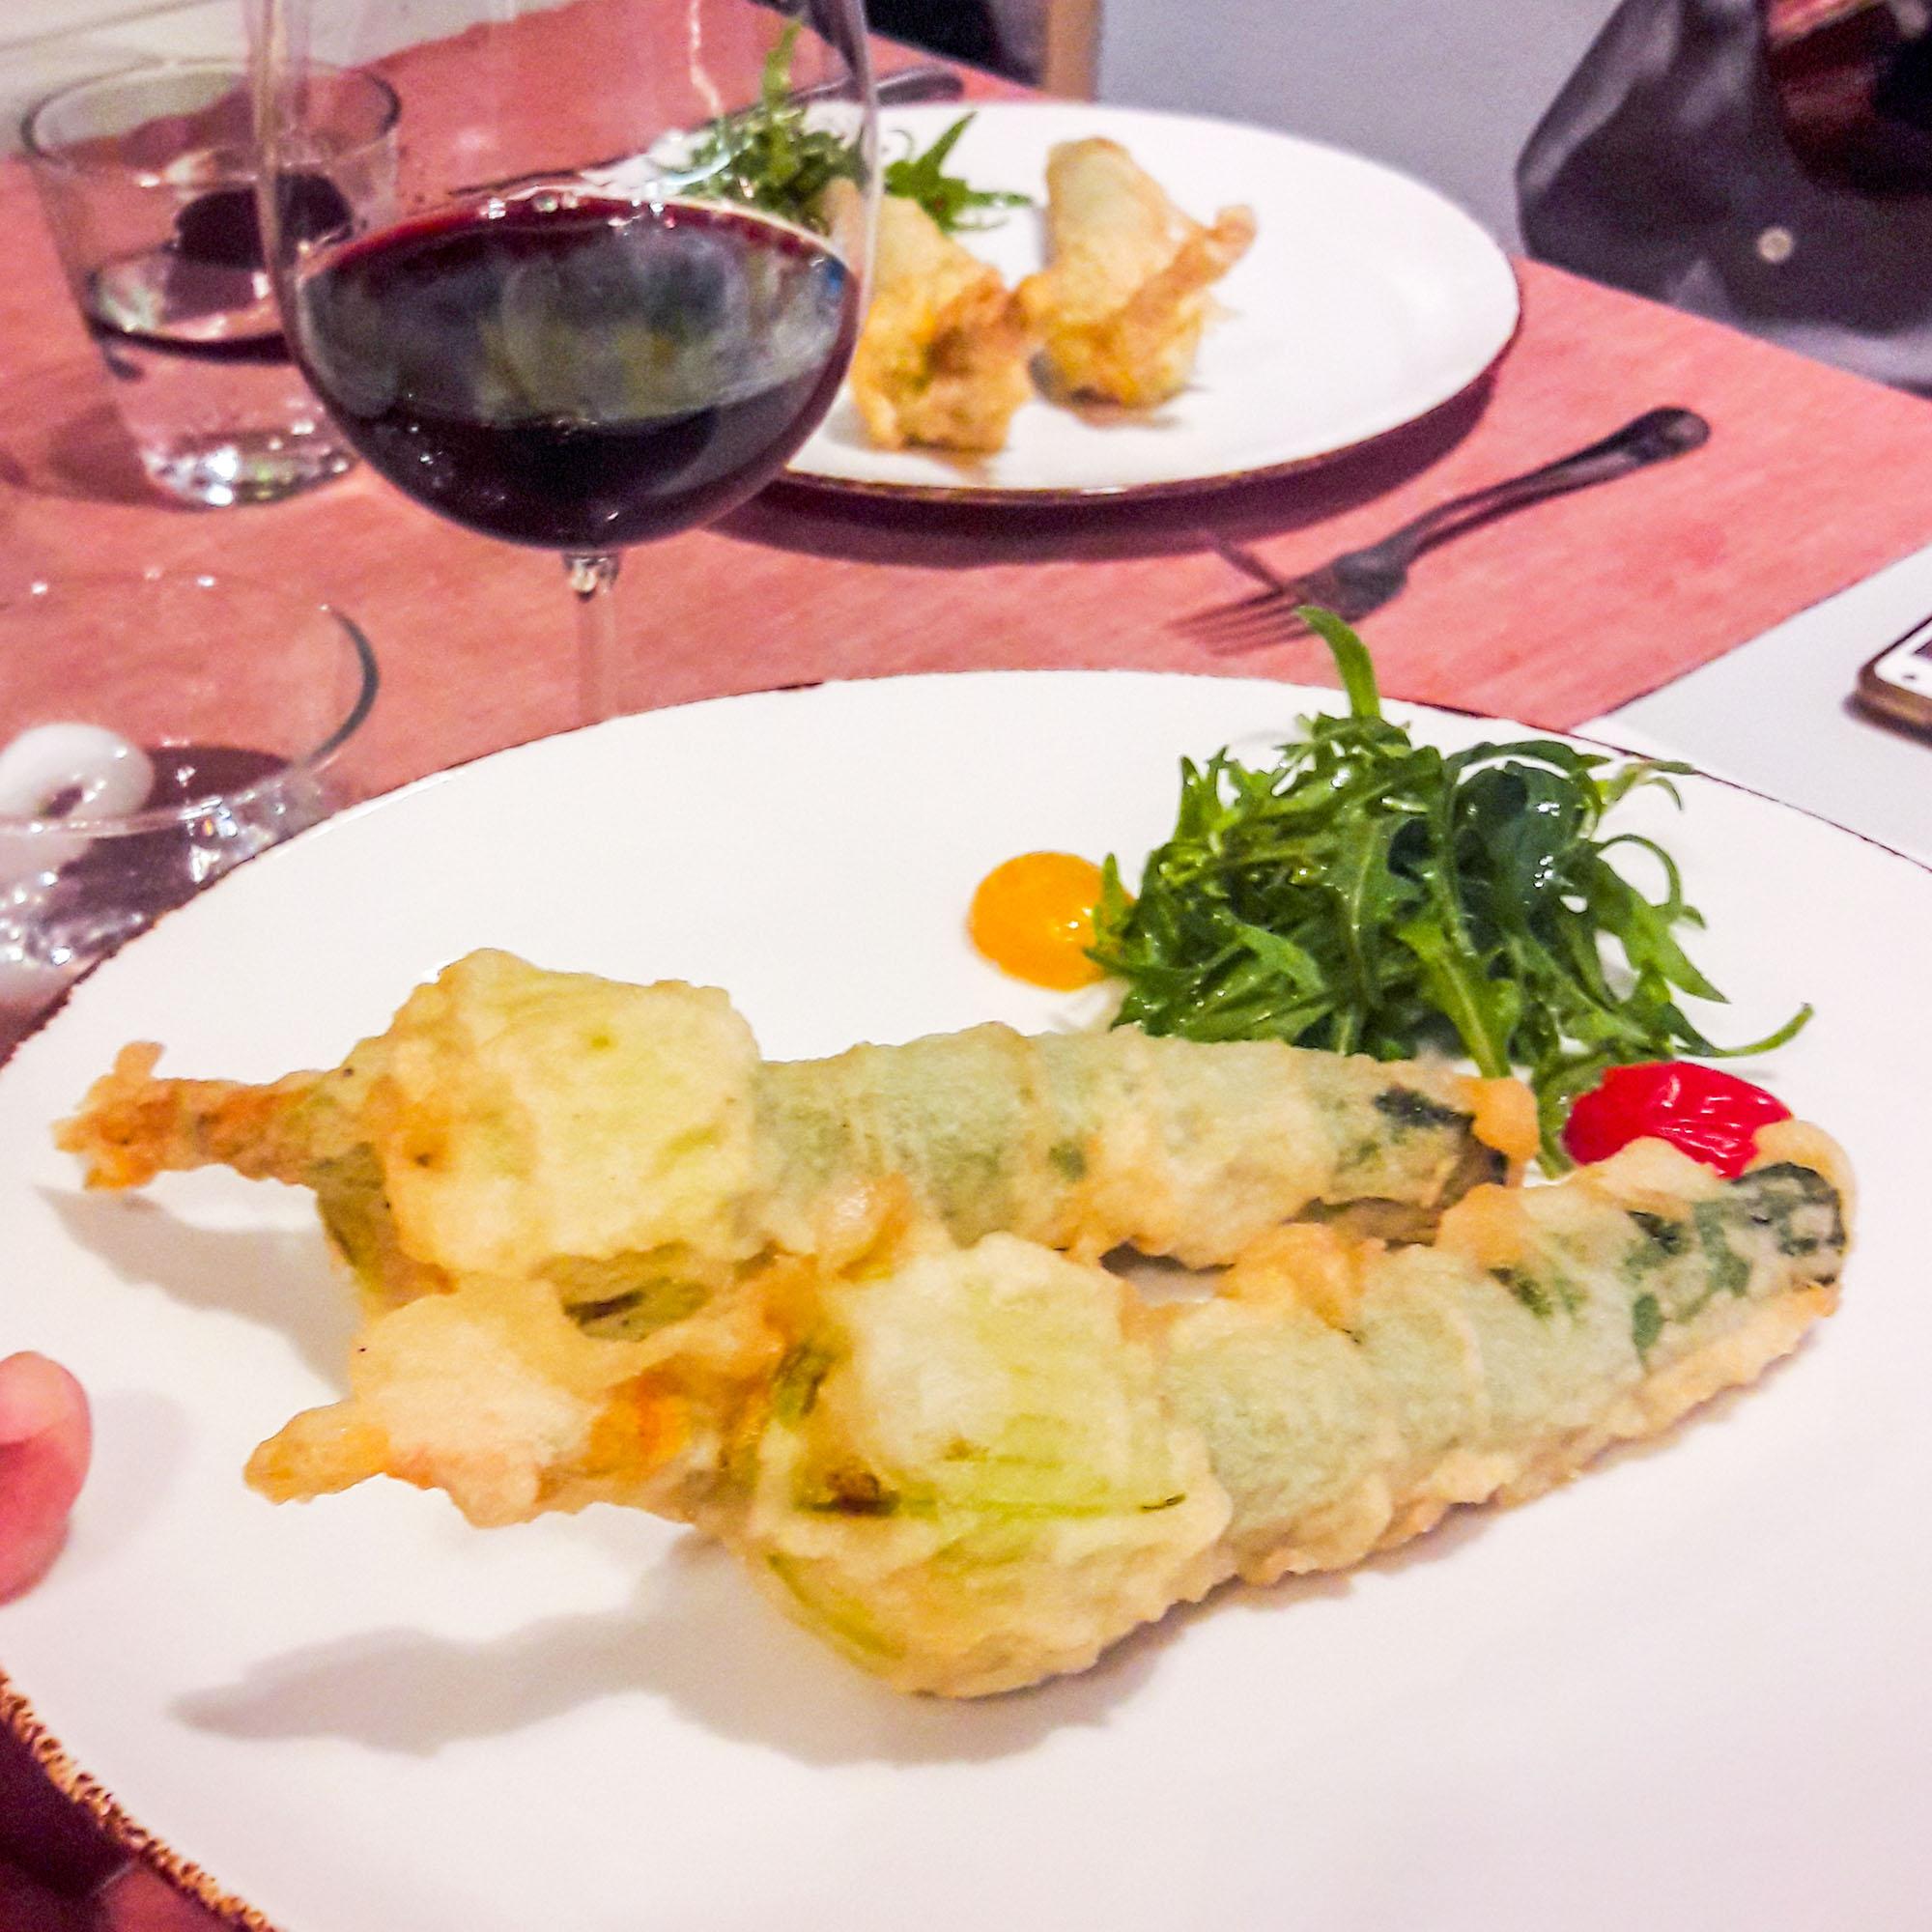 Calderazzo on 31 สุขุมวิท ร้านอาหารอิตาเลี่ยน  Calderazzo on 31 อาหารอิตาเลี่ยนแท้ๆ จัดแพริ่งไวน์ และ Grand Opening 20180510 205539